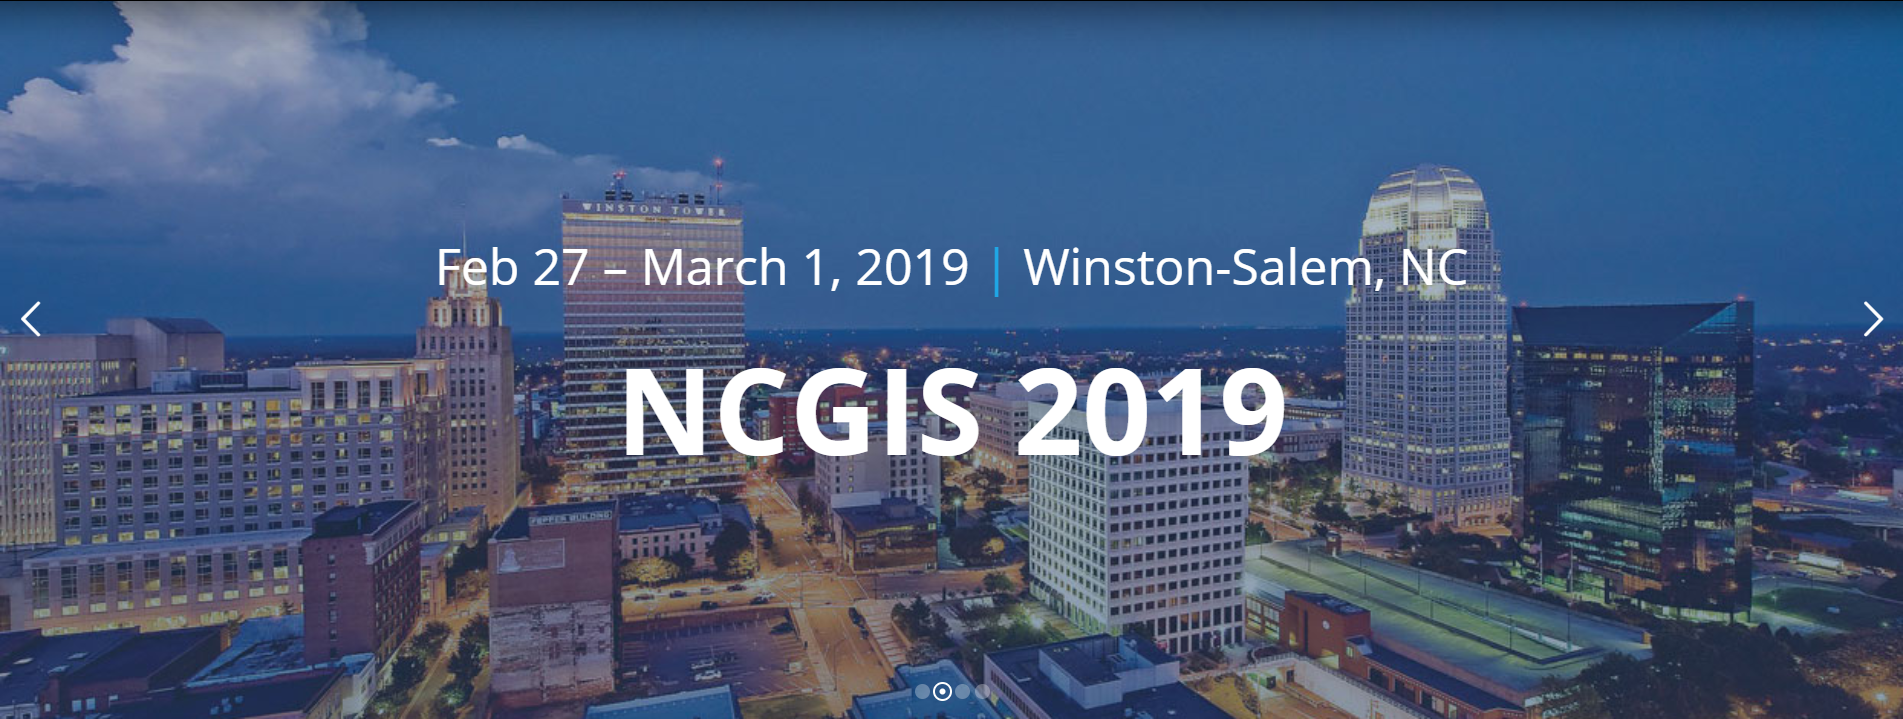 NCGIS email header image